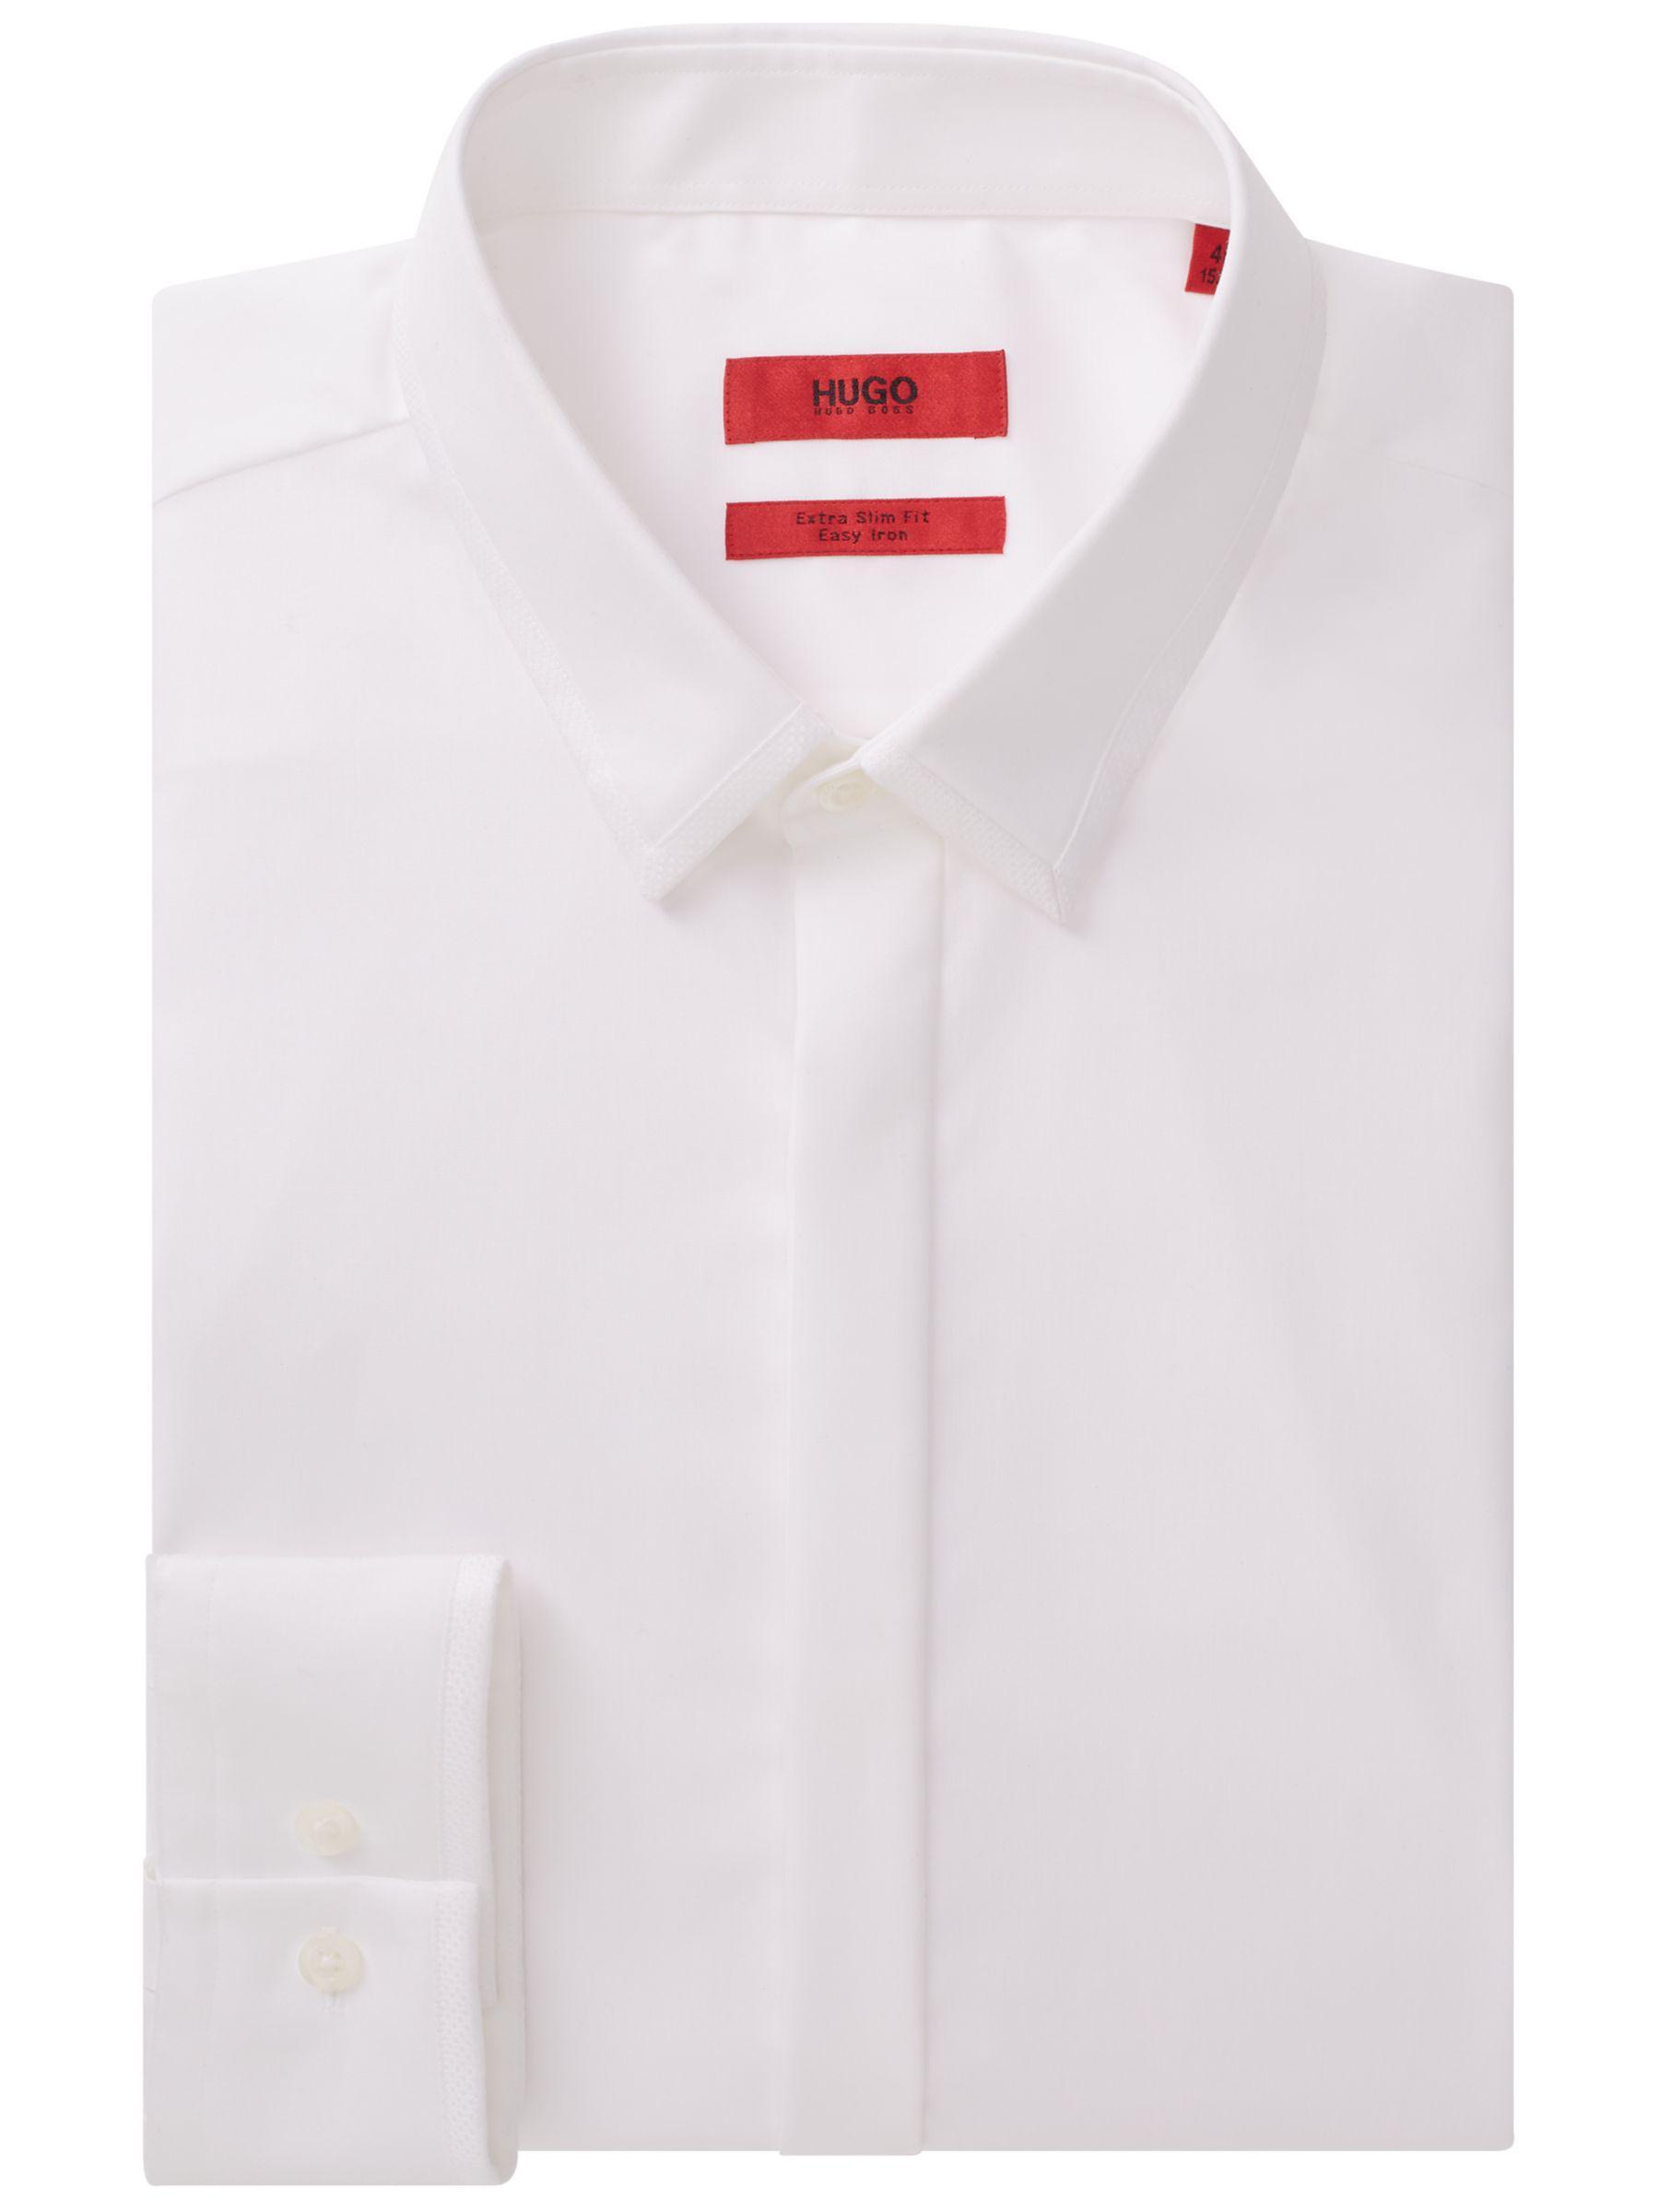 76bbc9fb2 John Lewis Mens Hugo Boss Polo Shirt